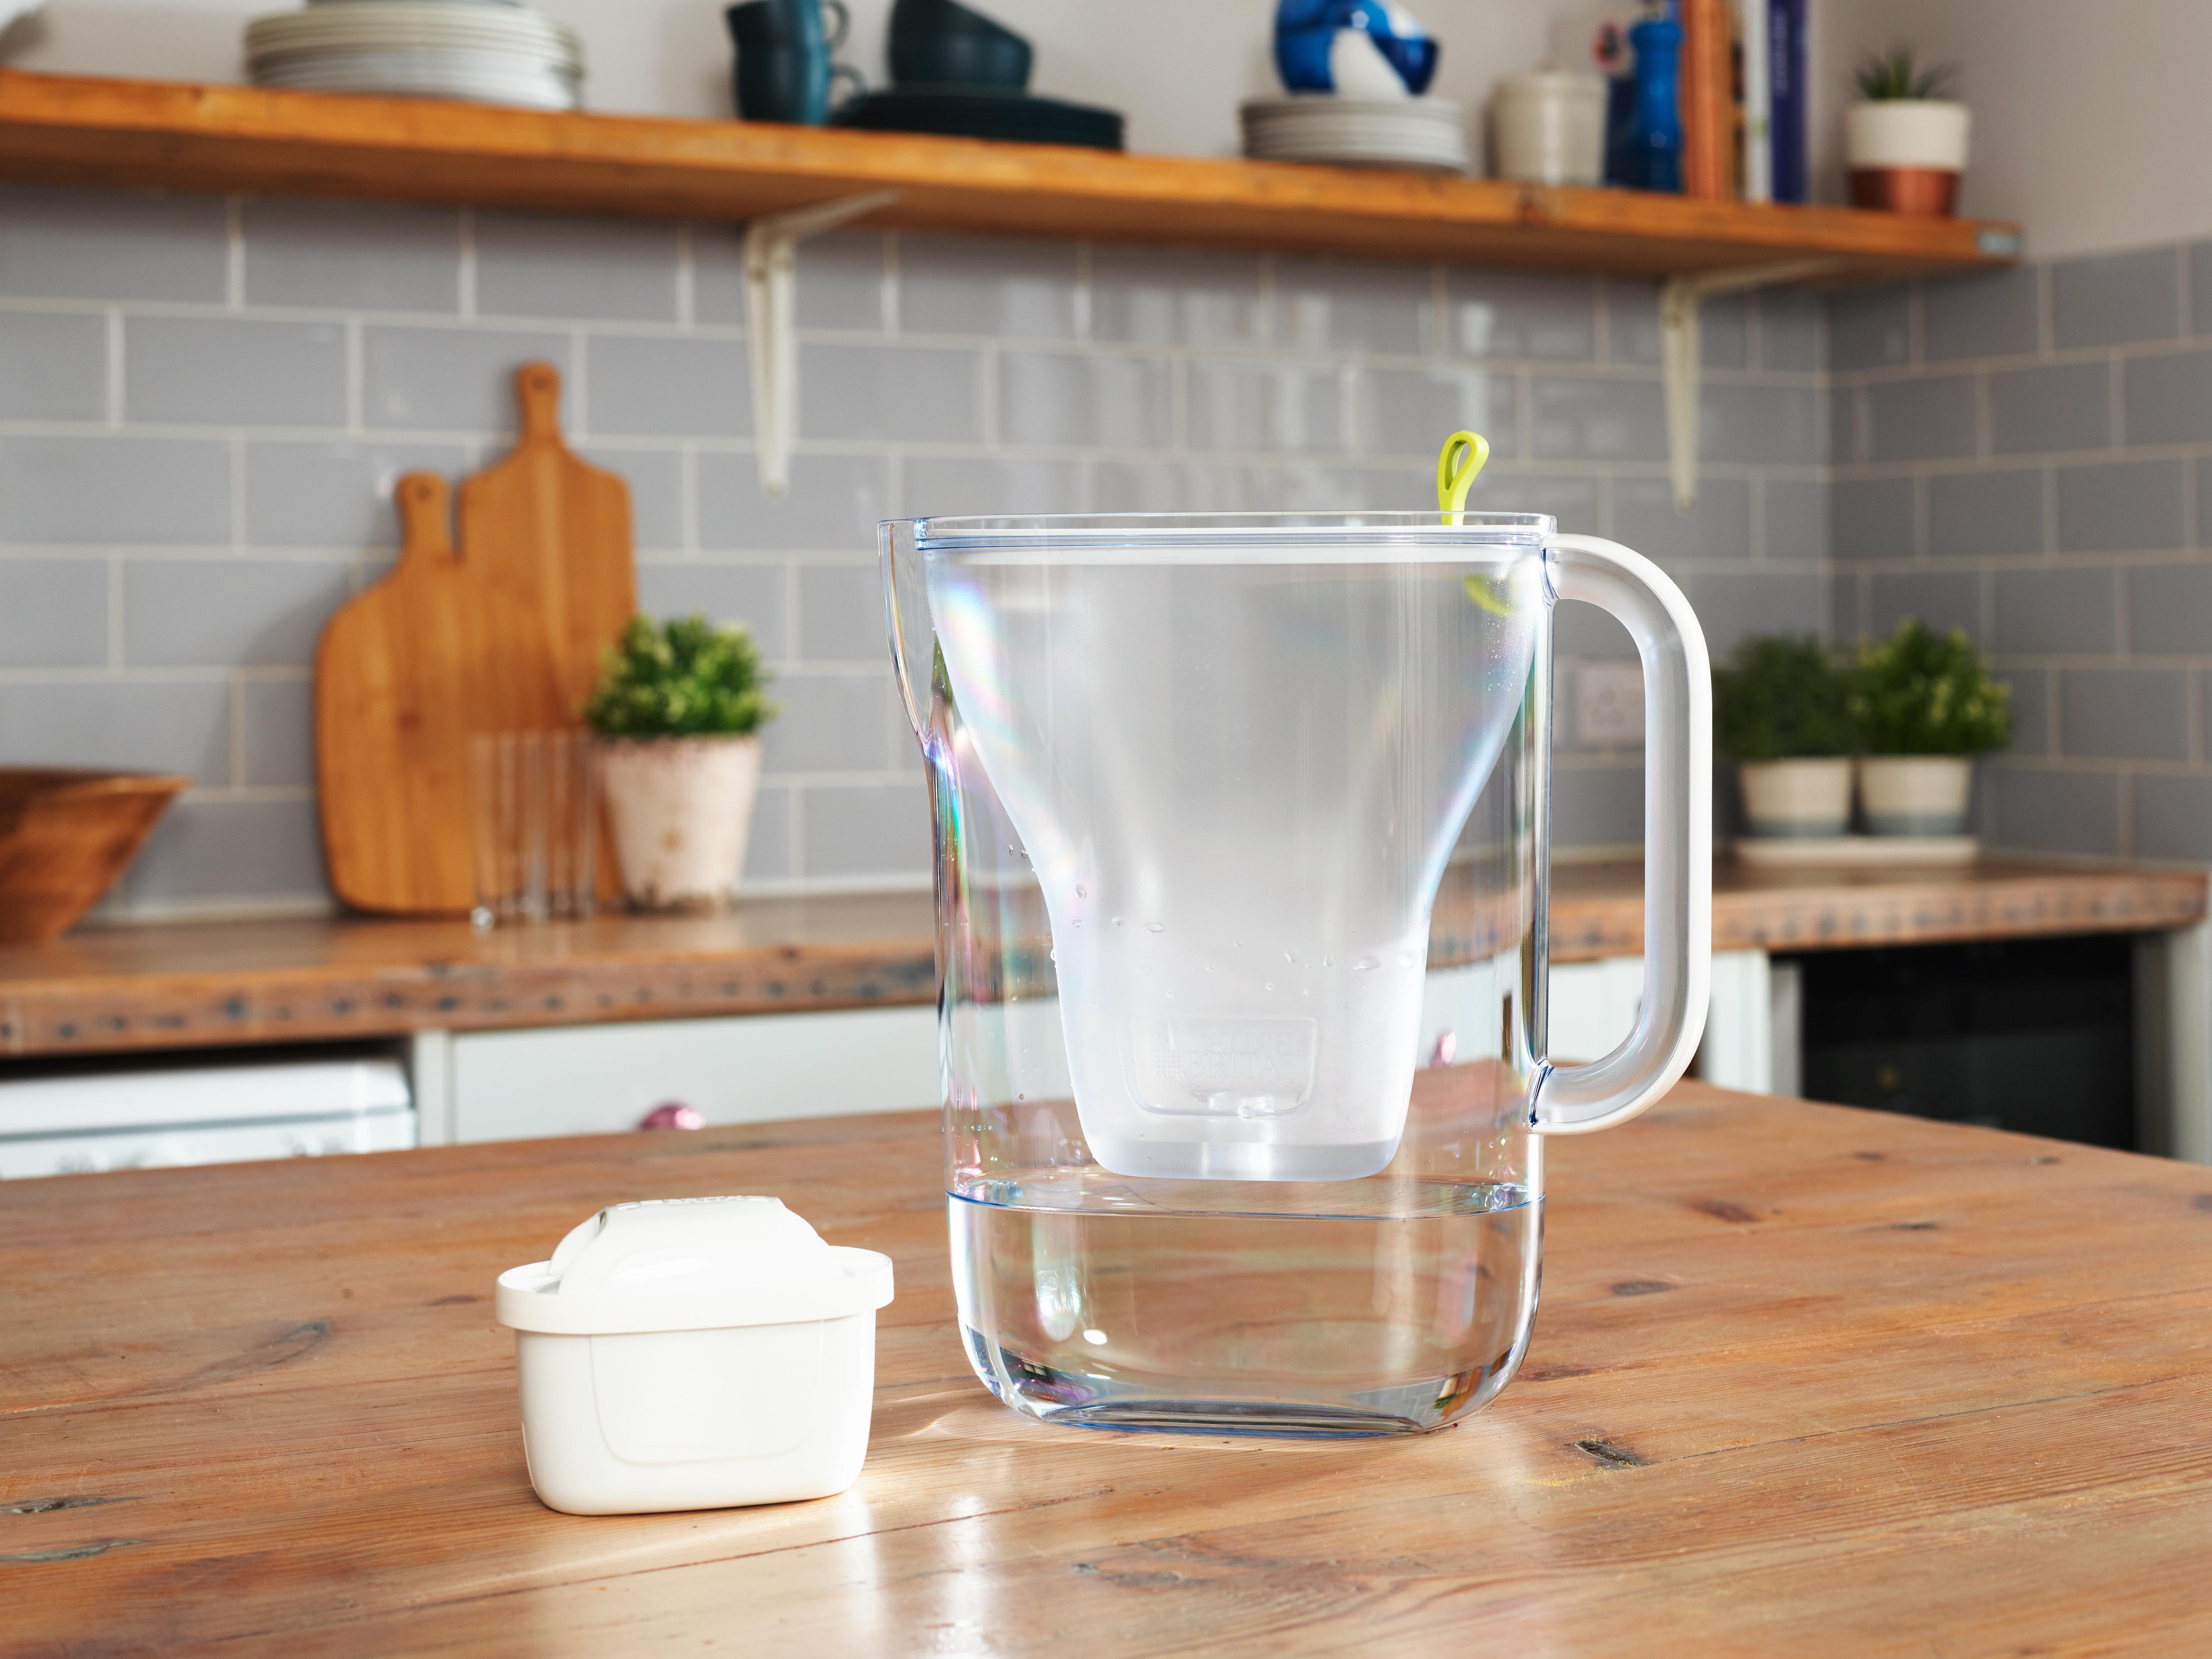 Style waterfilter jug on kitchen table